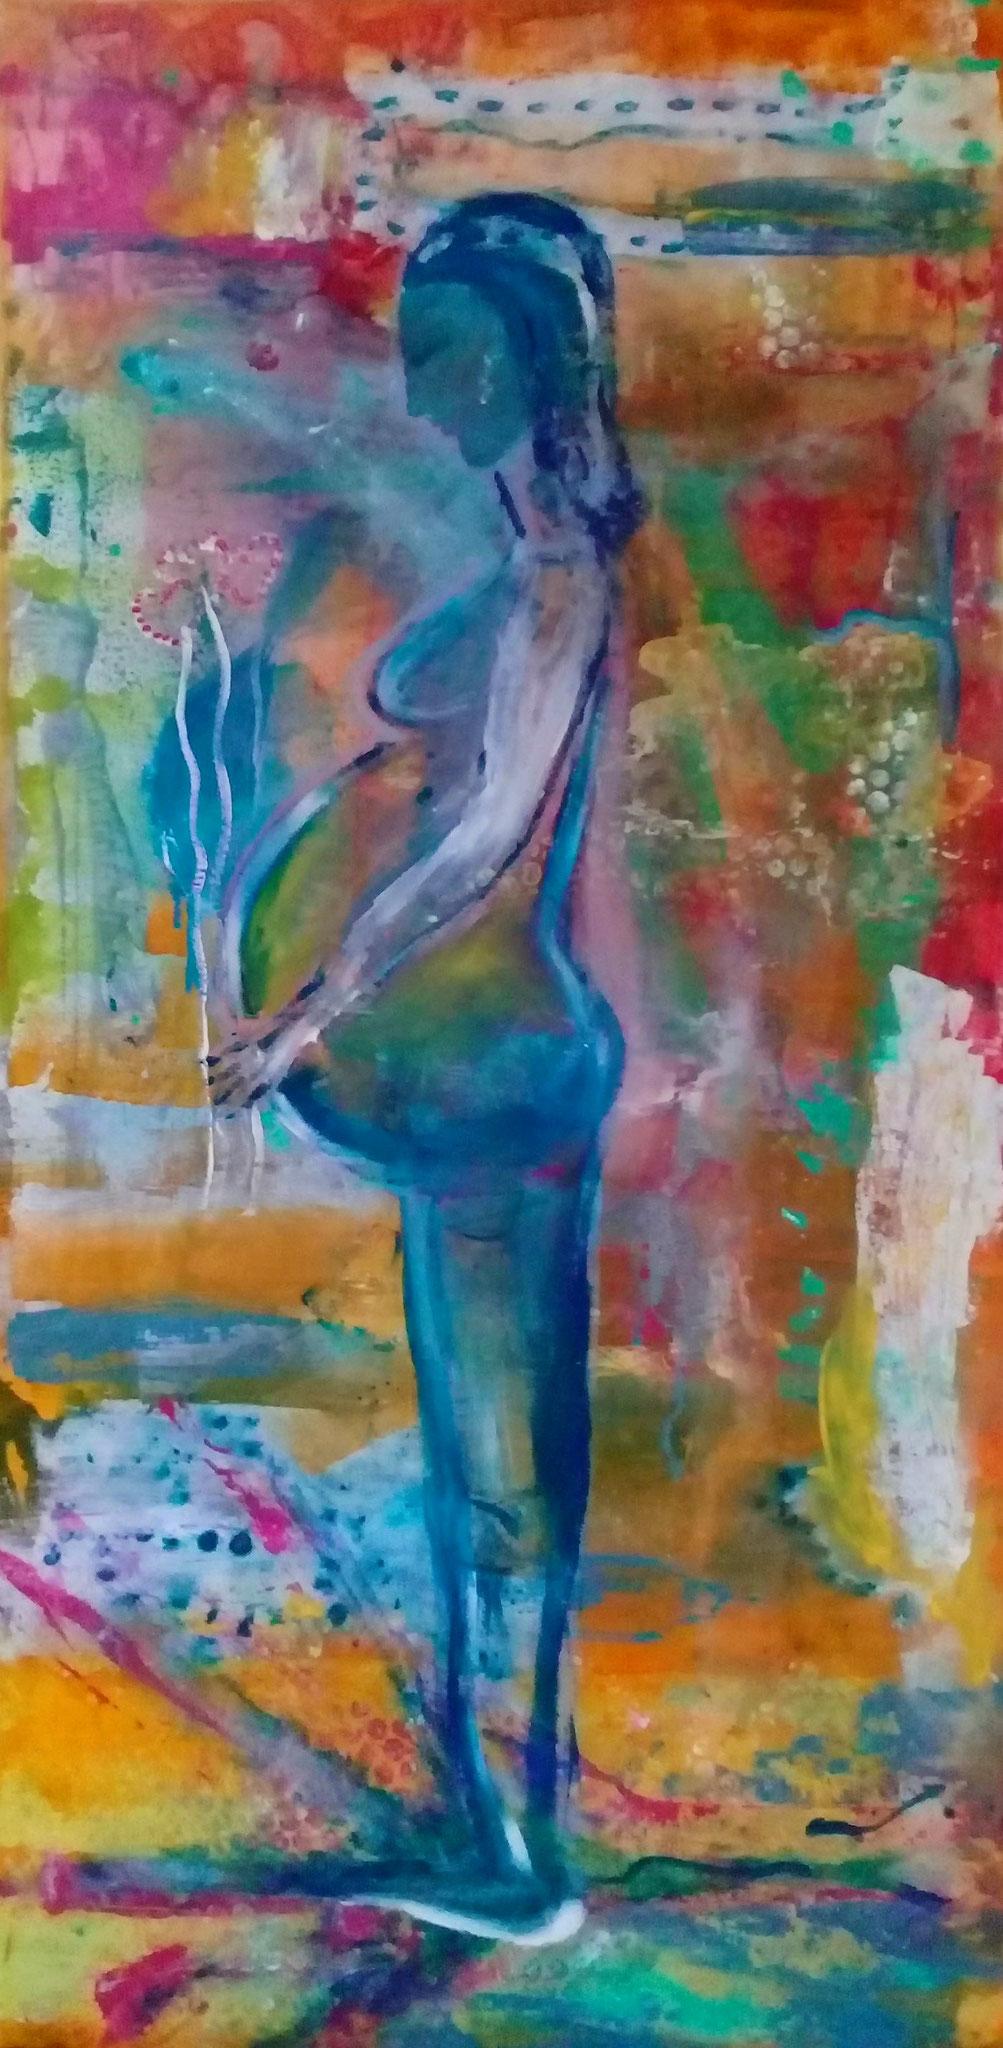 """Jnja & Tamino"", 2018, 70x50 cm, acrylic on canvas, alexandra benesch"